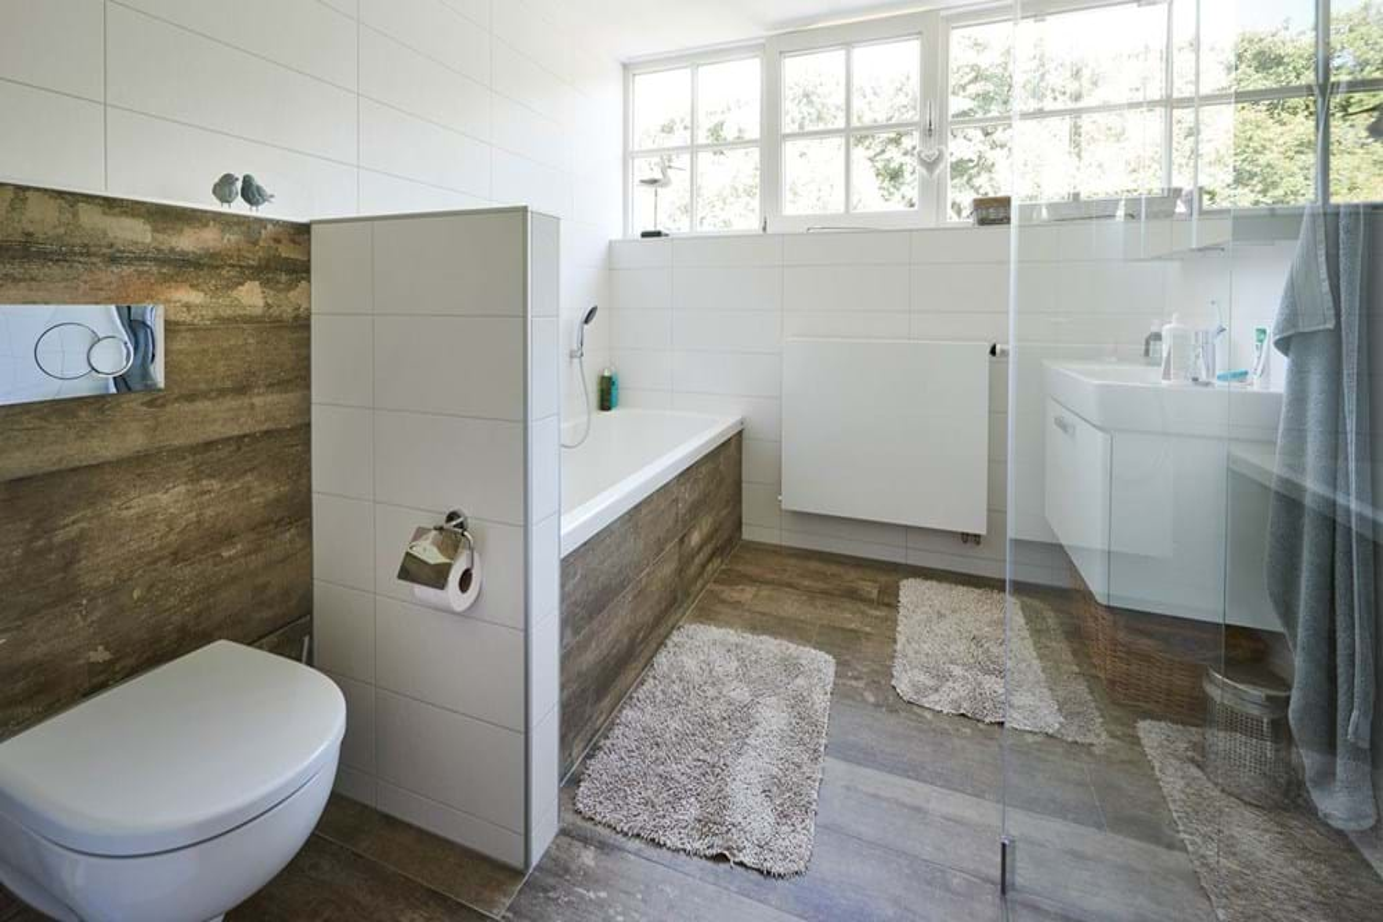 nieuwe keuken en badkamer kopen in burgh haamstede db